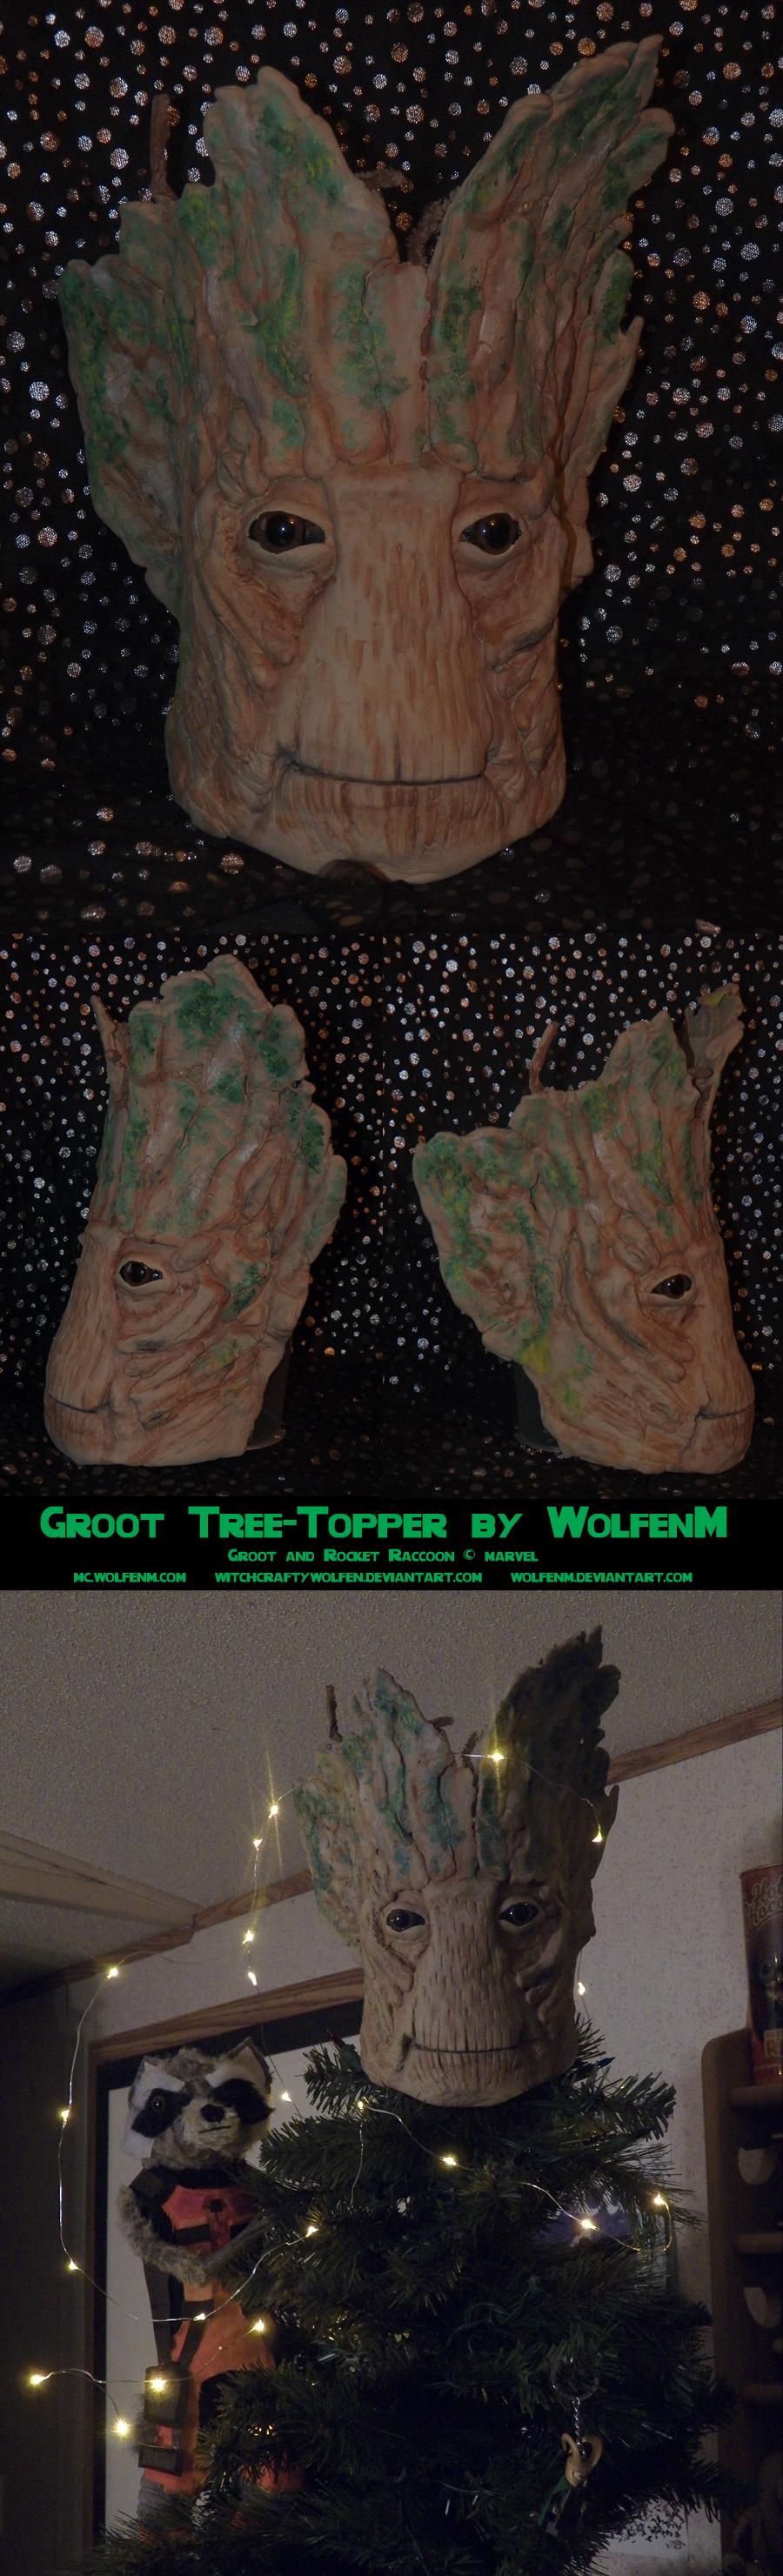 GotG: Groot Tree-topper